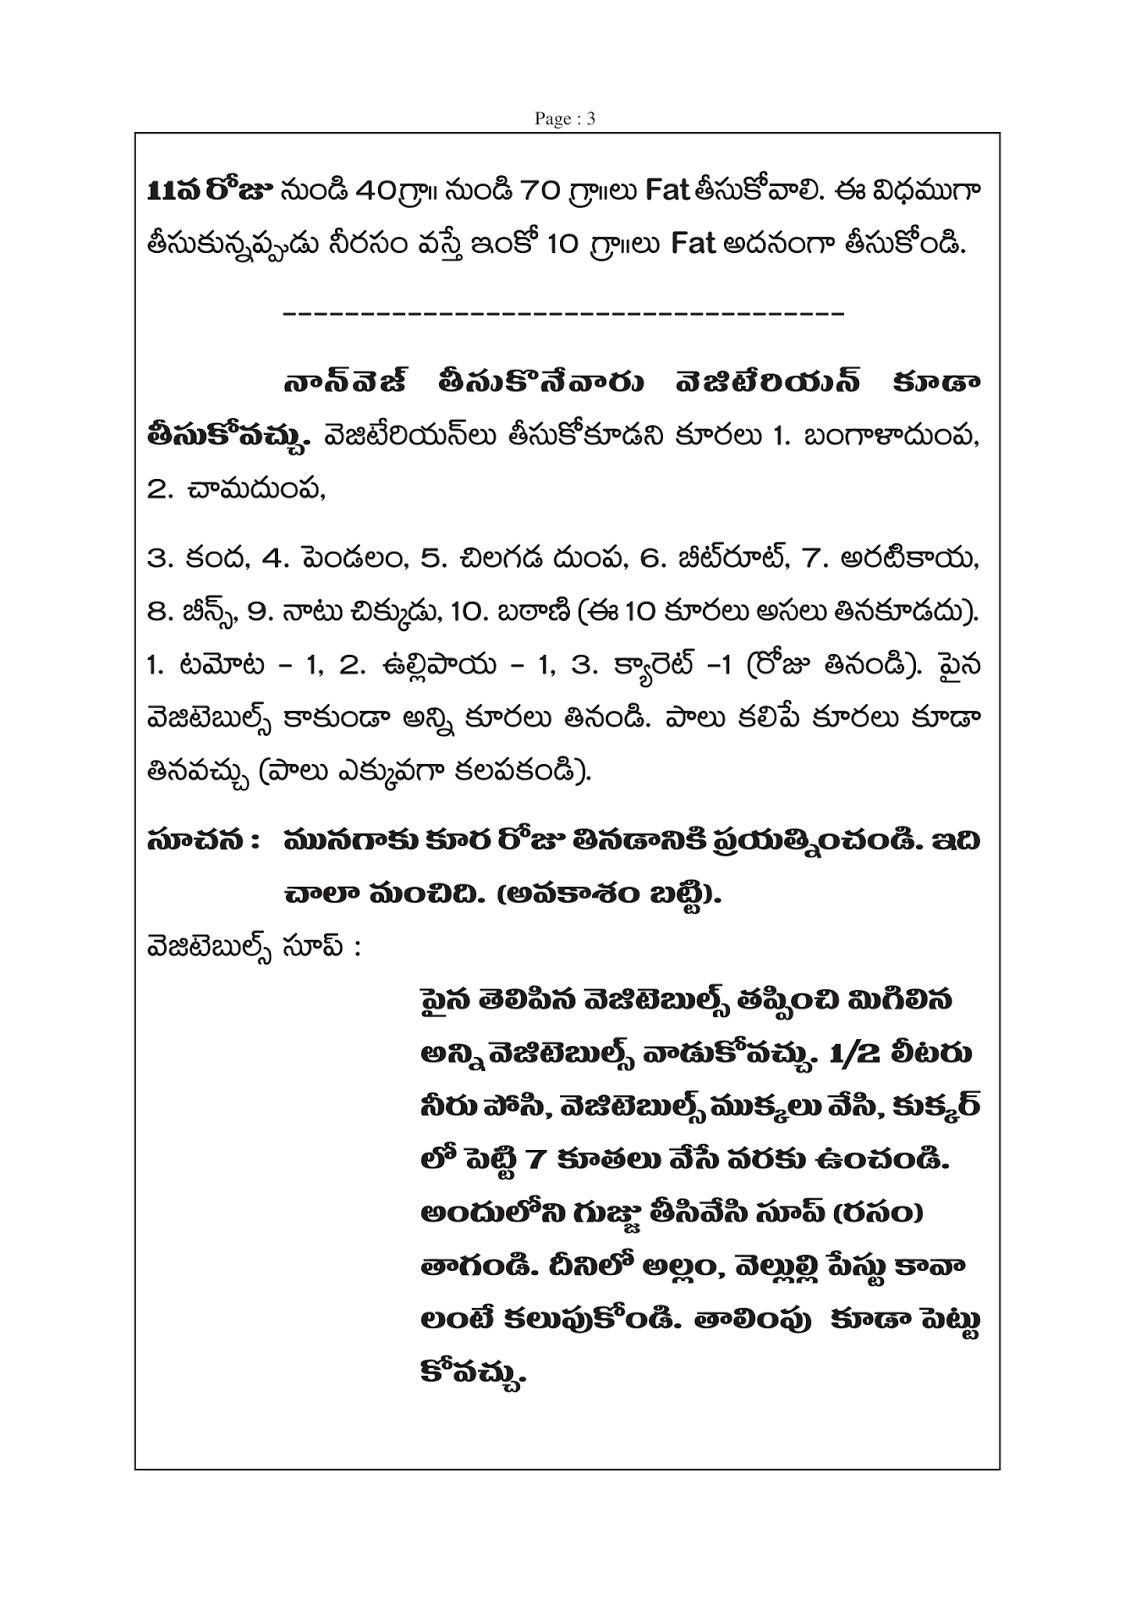 Veeramachaneni ramakrishna food program also diet pillar in telugu part rh veeramachaneniramakrishnadietprogramspot